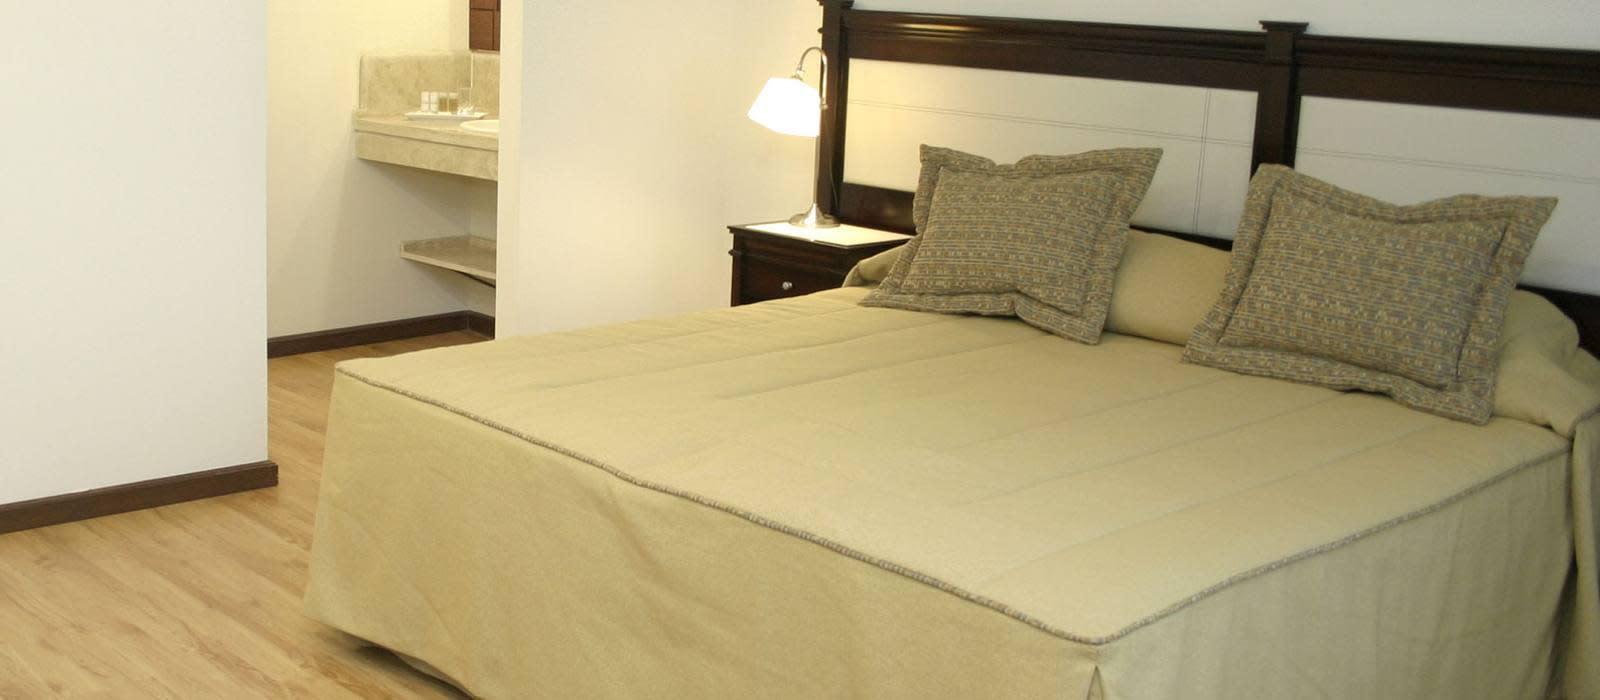 Hotel Villaggio Argentinien